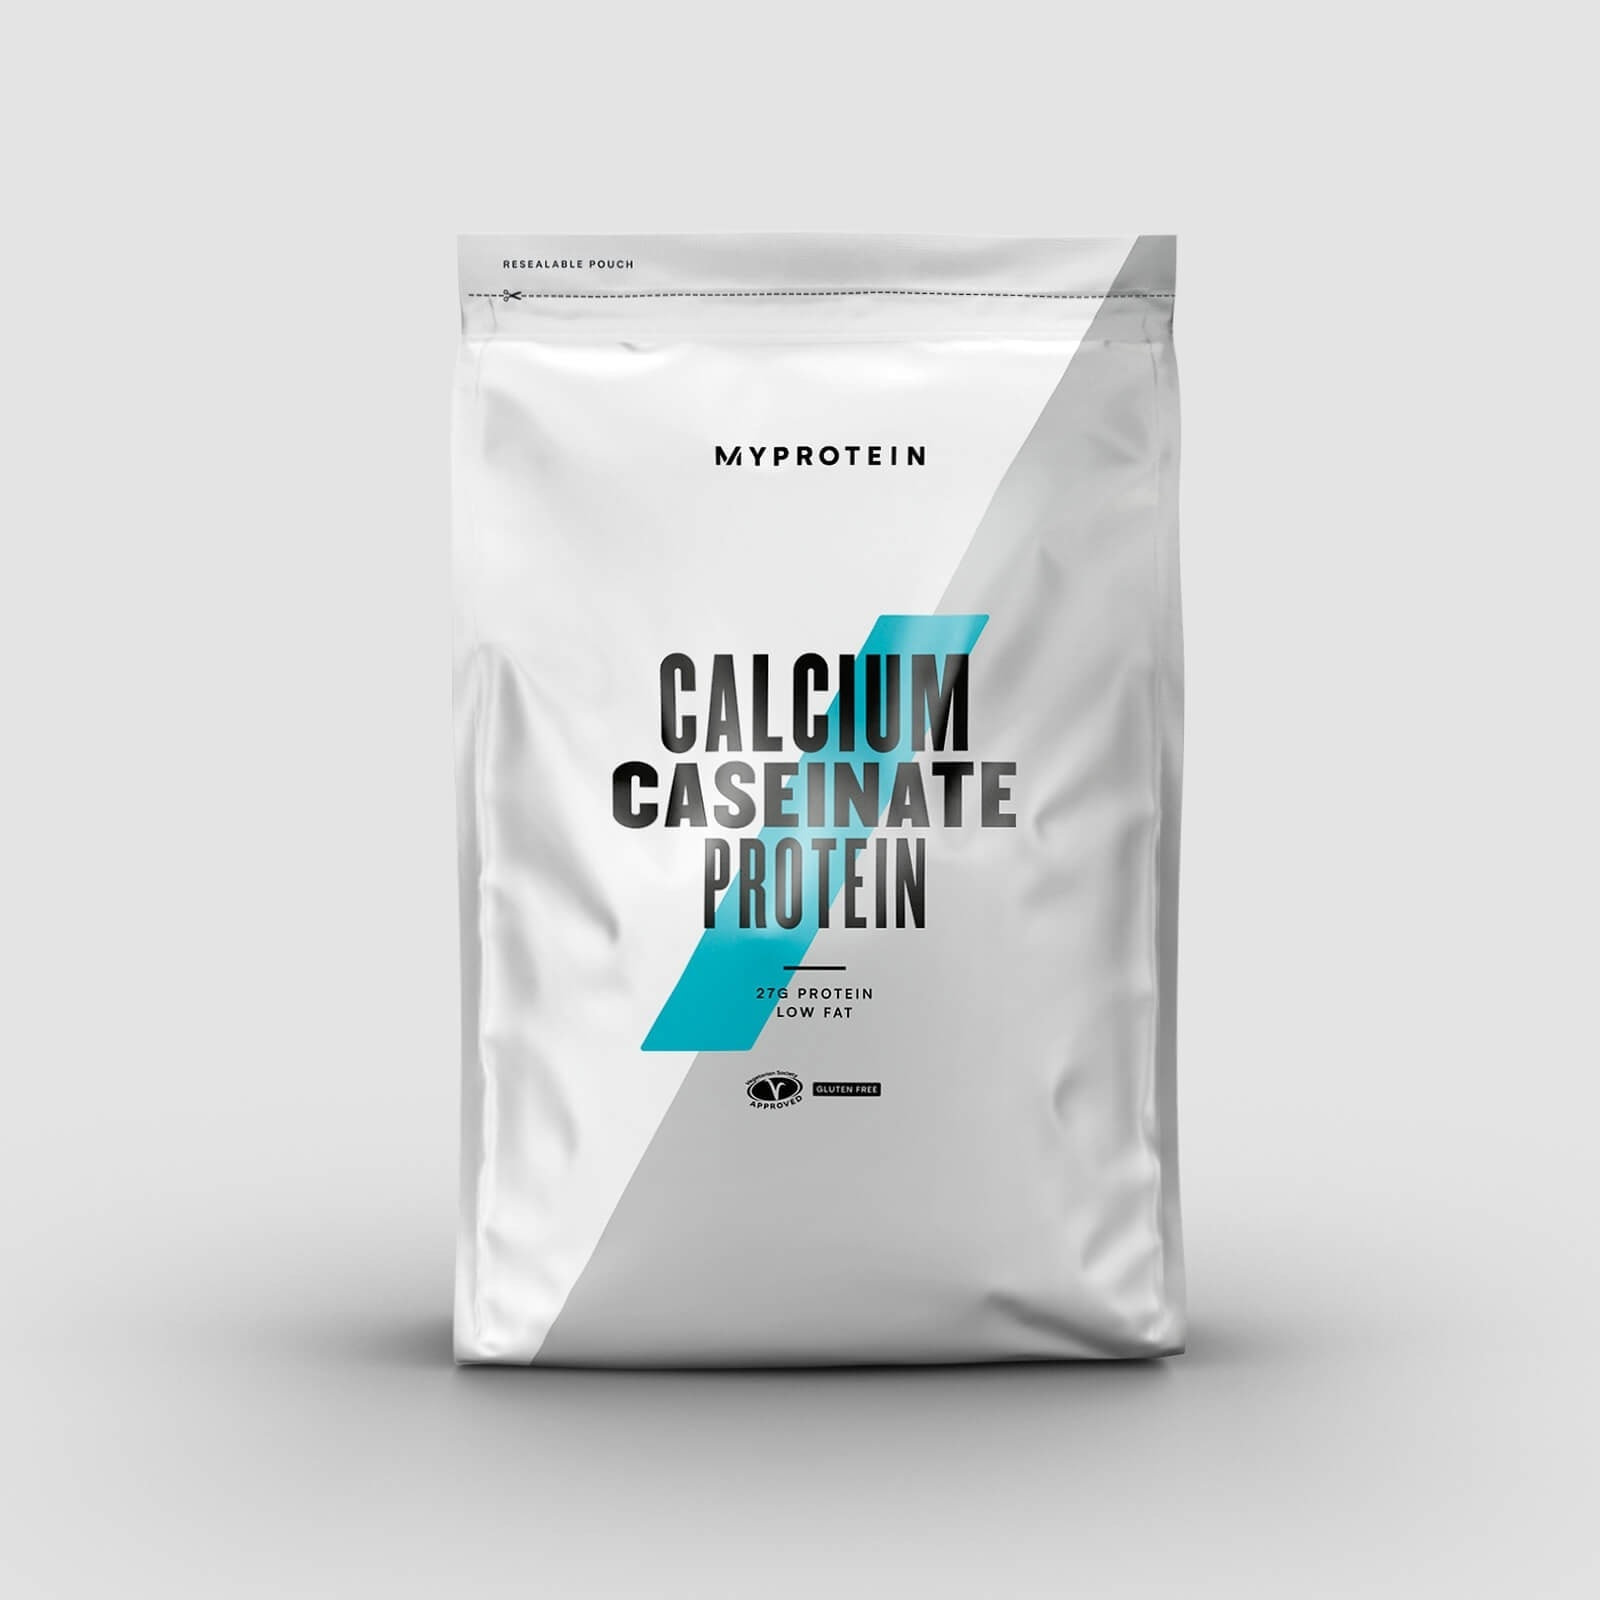 Myprotein - Calcium Caseinate (1KG) - 10529260 1684620643872906